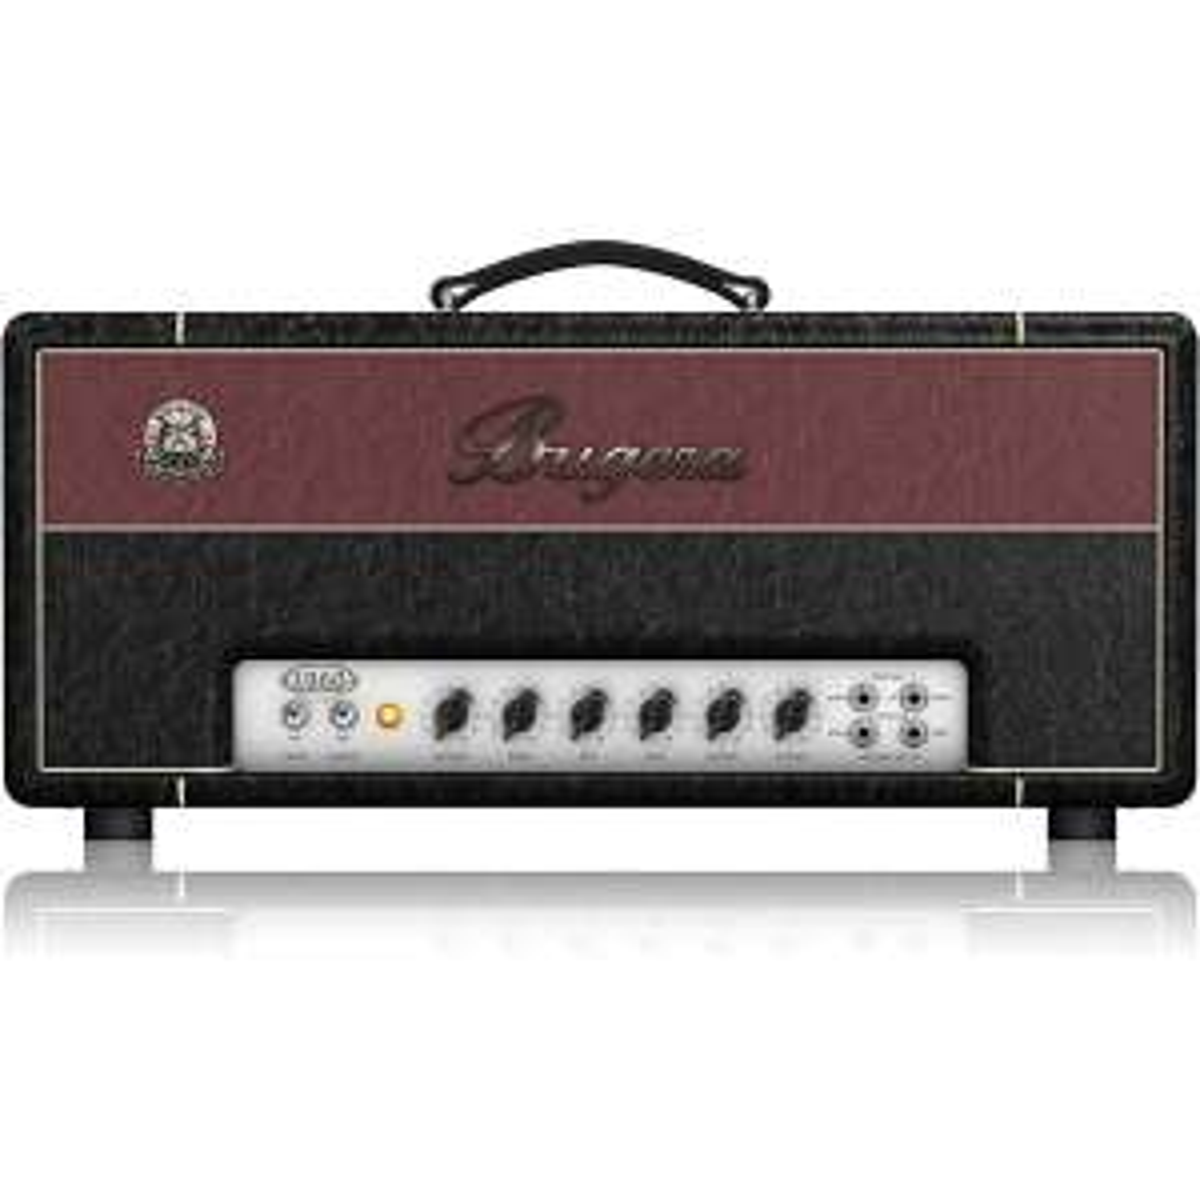 Bugera 1960 Infinium British Classic 150 Watt Valve Guitar Amplifier Head - £299 at Dawsons Music